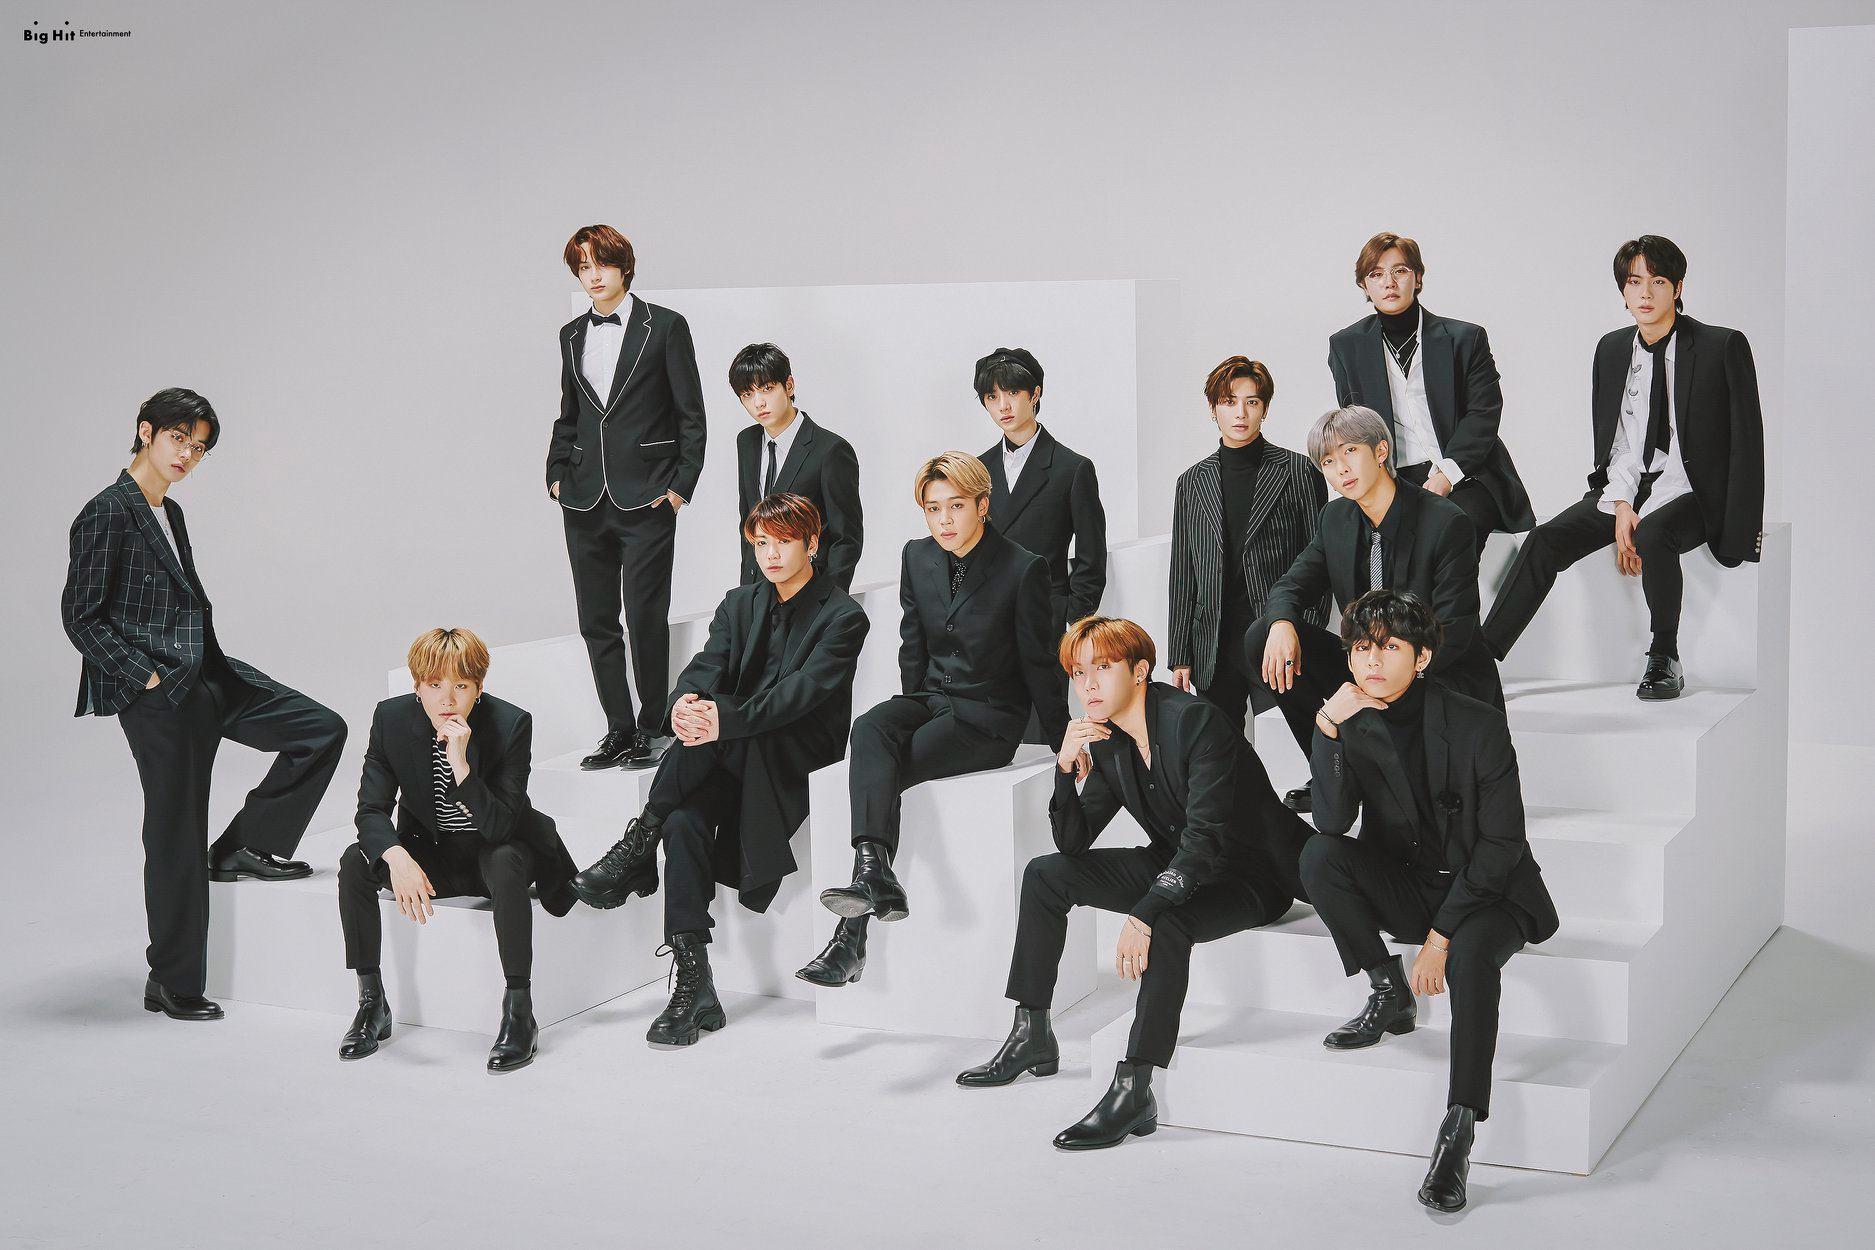 BigHit 15th Anniversary (BTS, TXT, Lee Hyun) Group Photos (HD/HR)